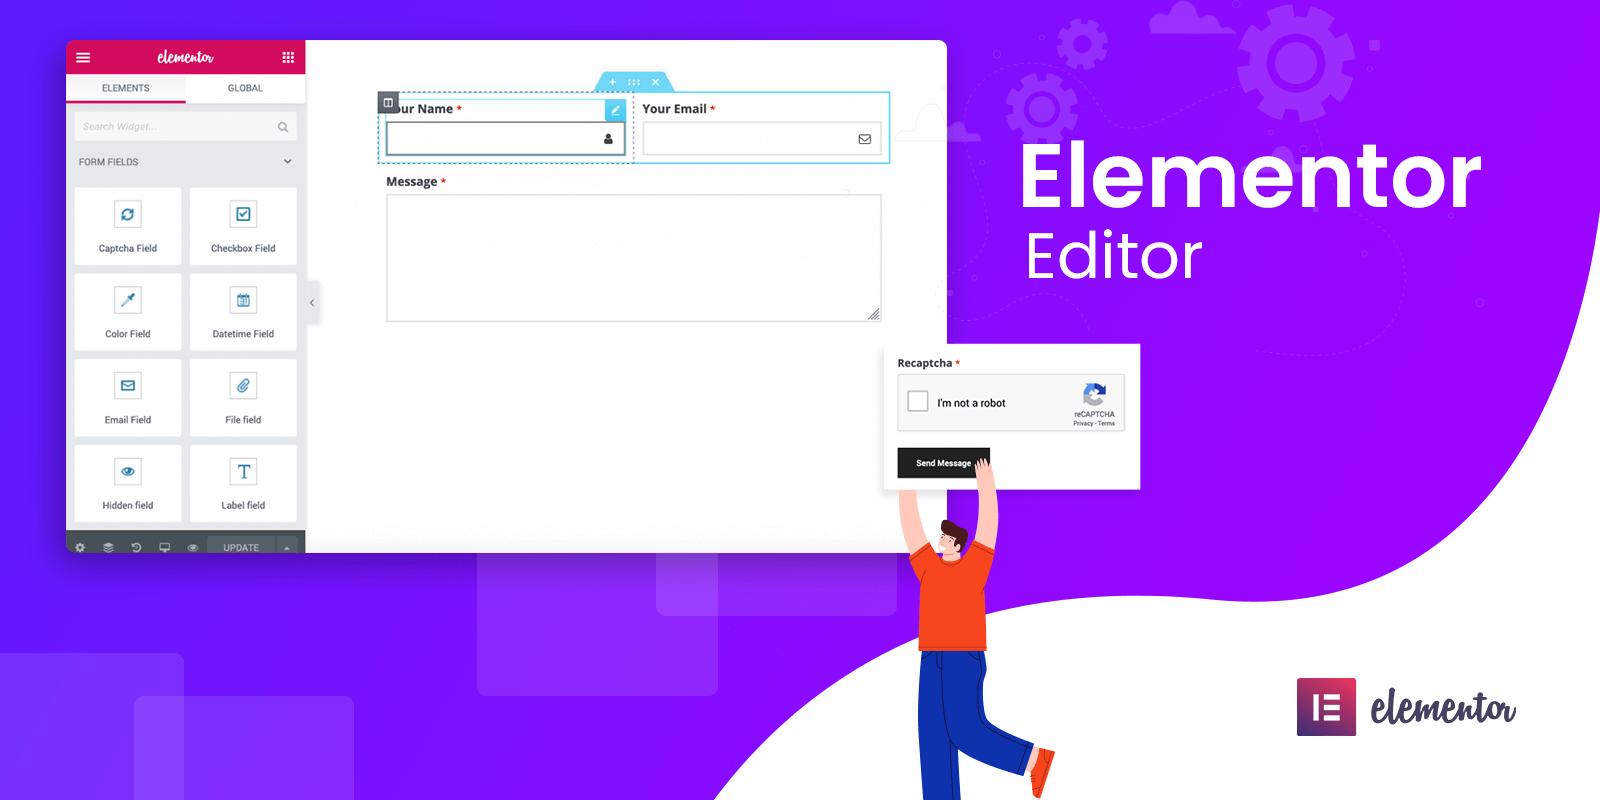 Elementor editor